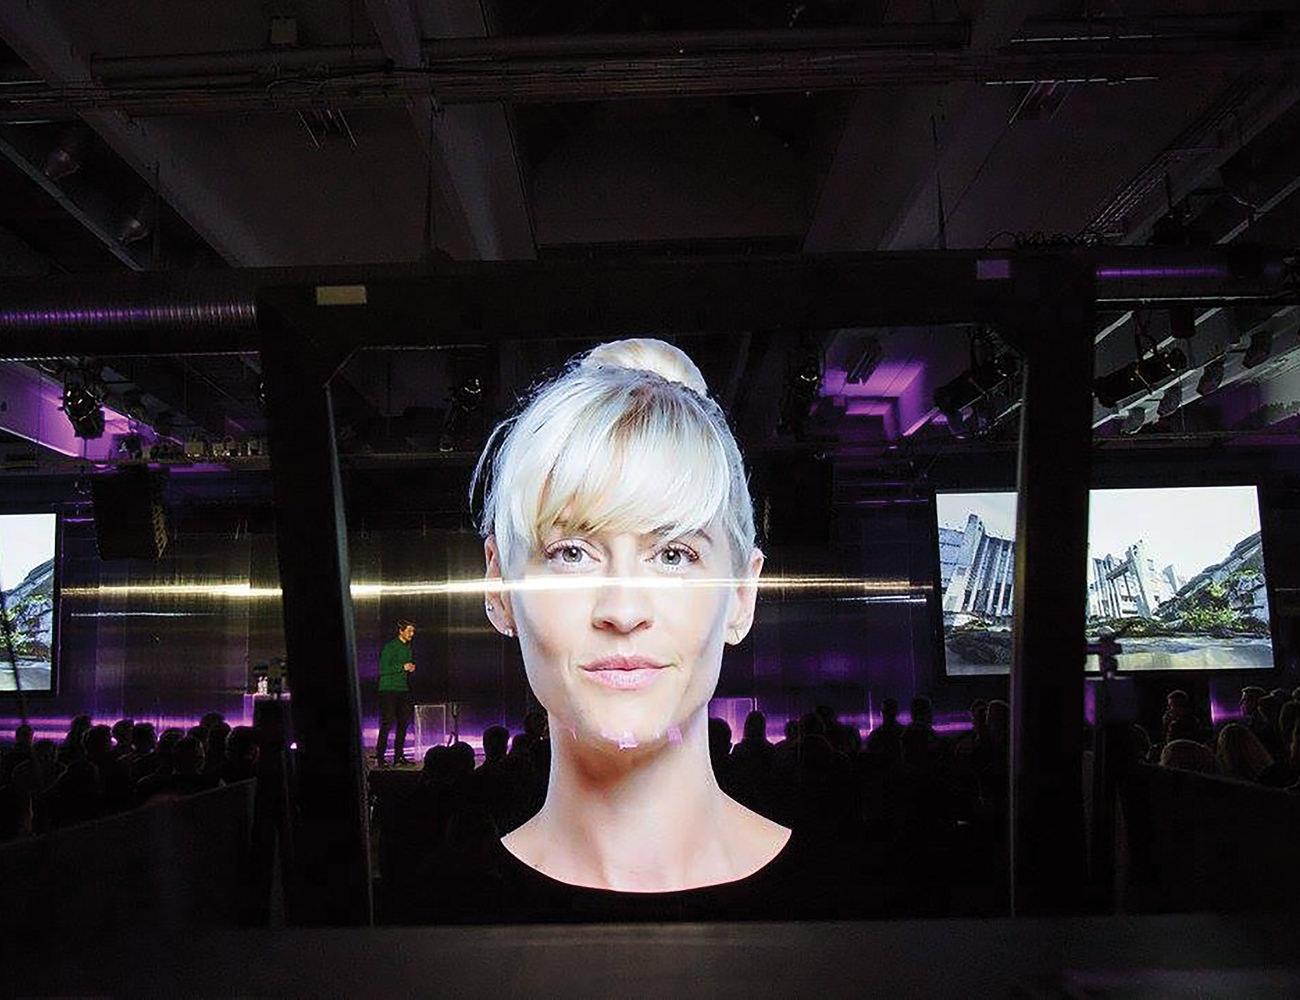 DeepFrame Life Size Augmented Reality Display